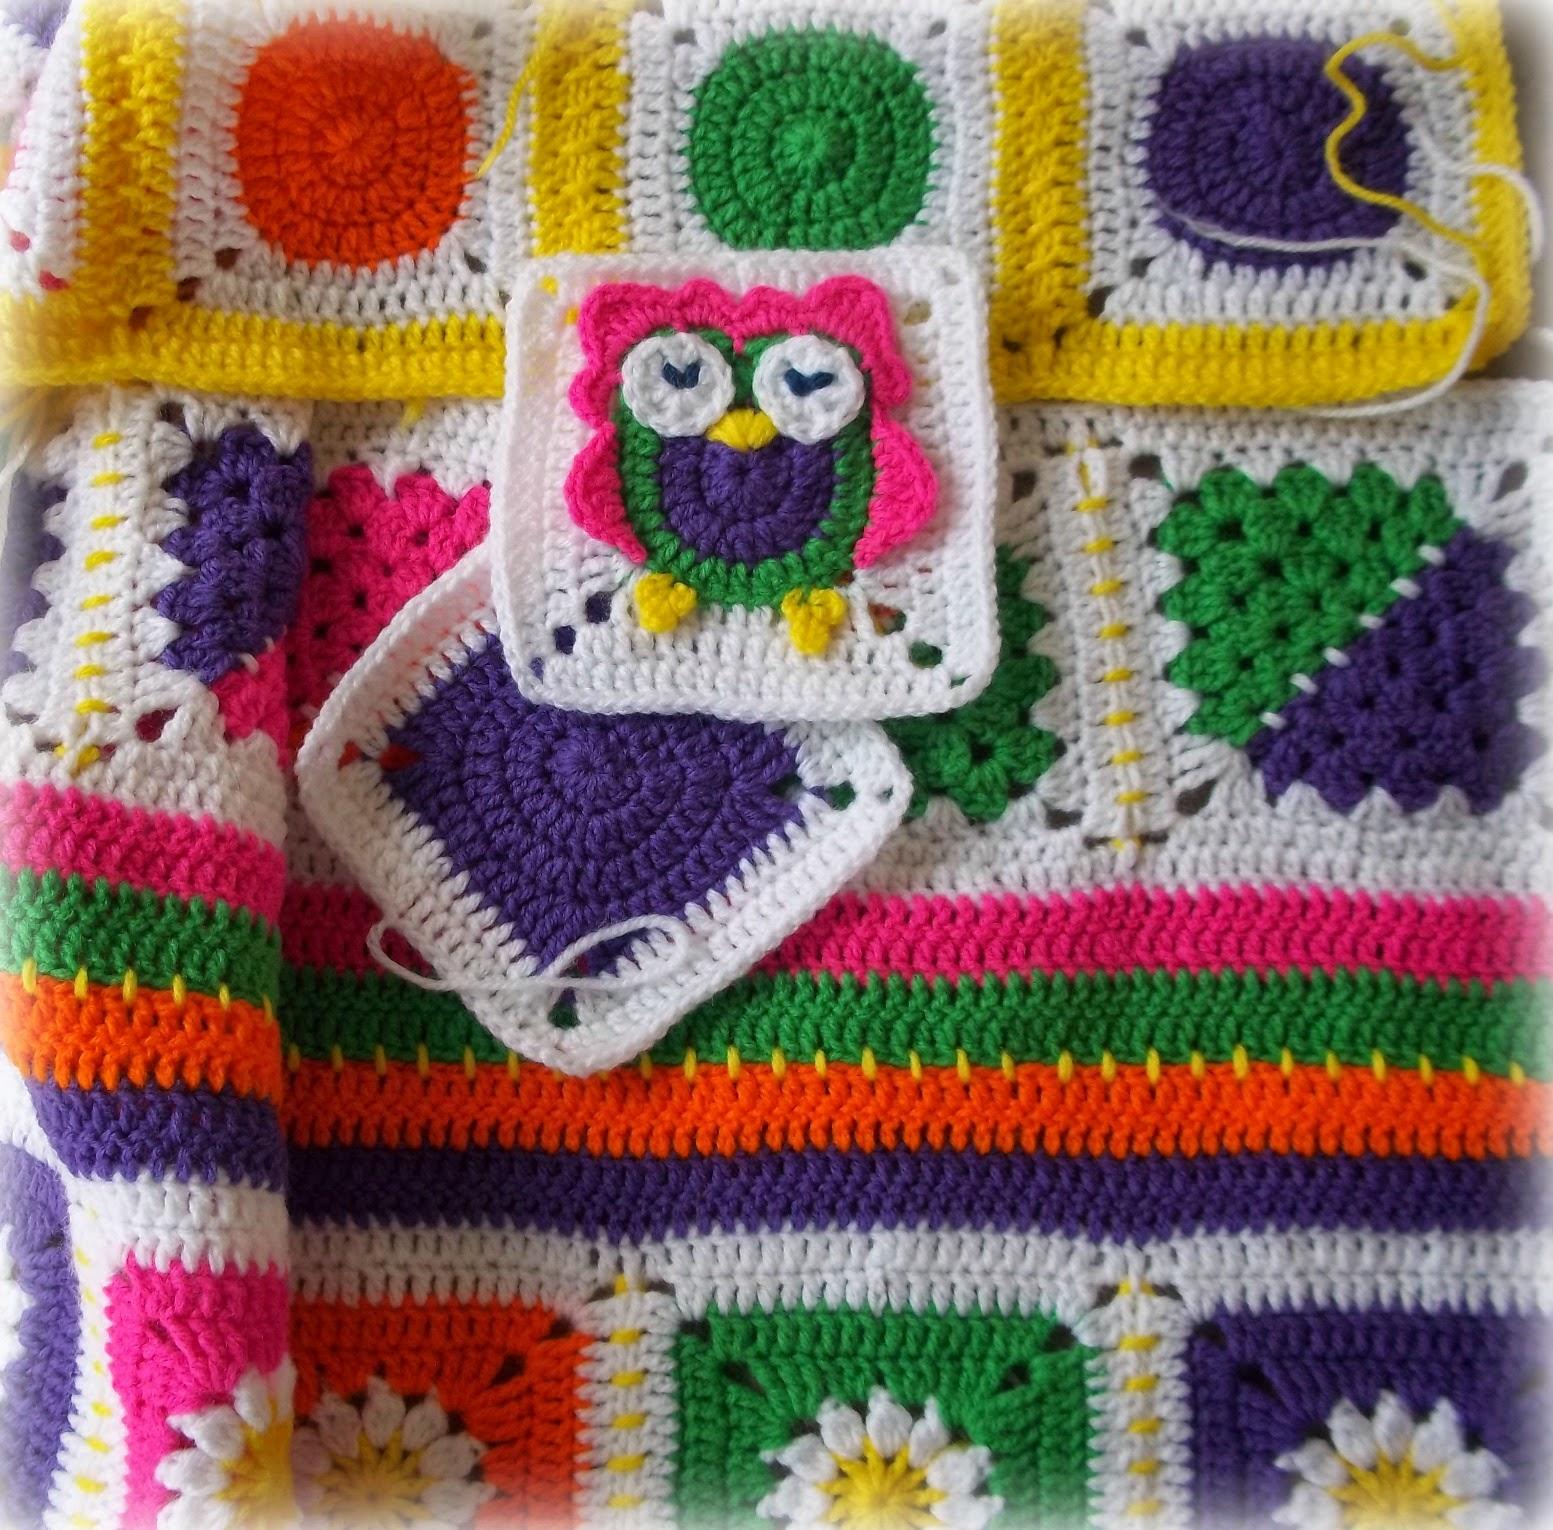 Zooty Owls Crafty Blog: baby blankets